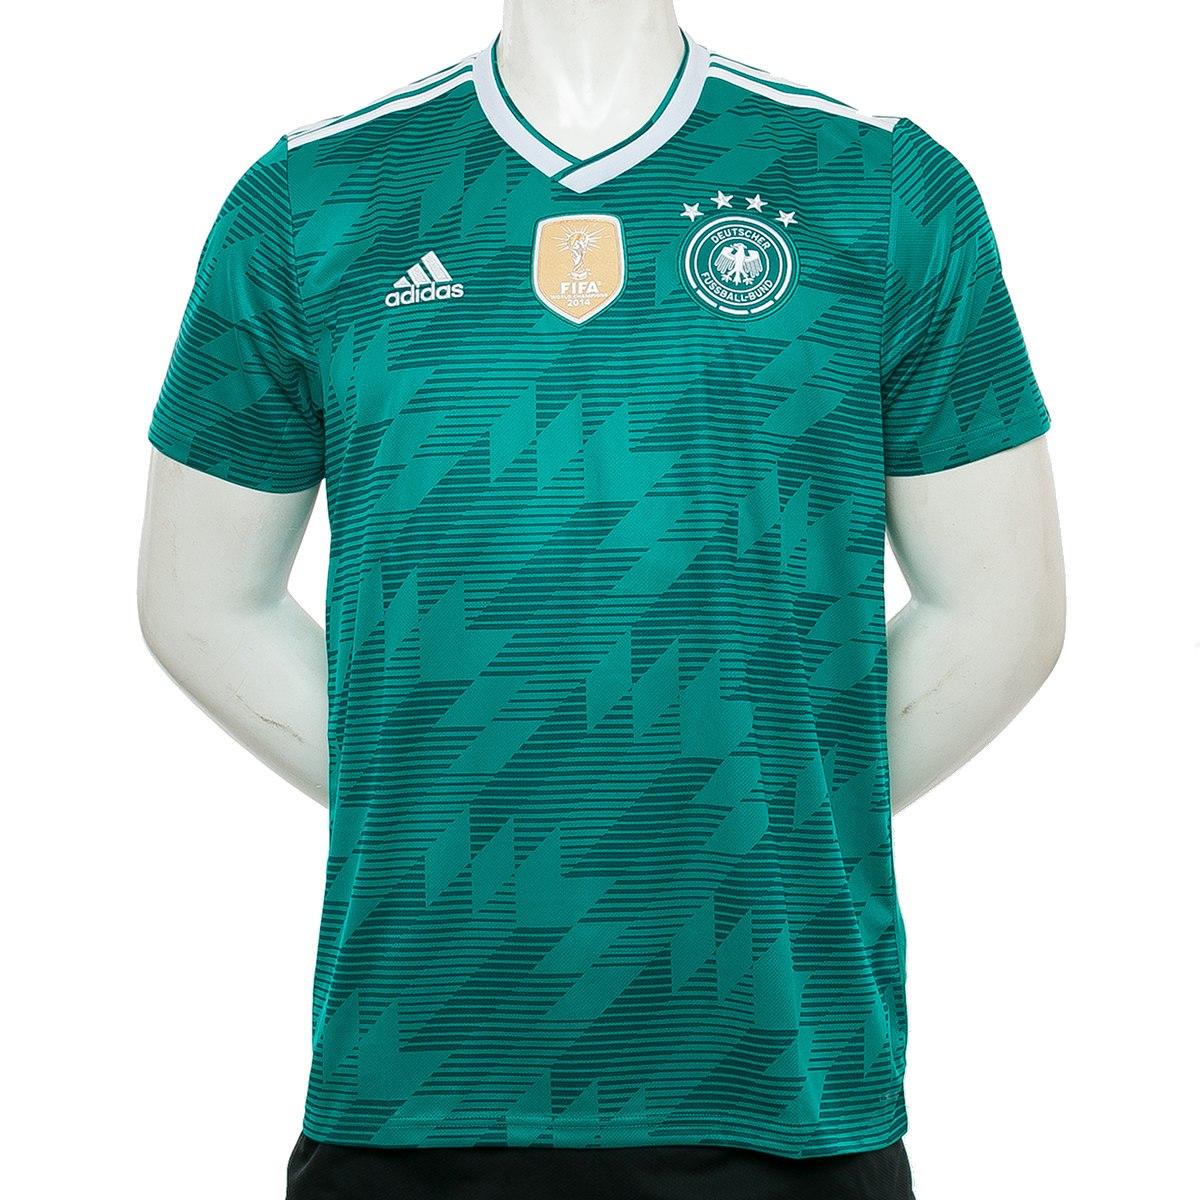 db0c81d26ddff camiseta alemania dfb away adidas sport 78 tienda oficial. Cargando zoom.